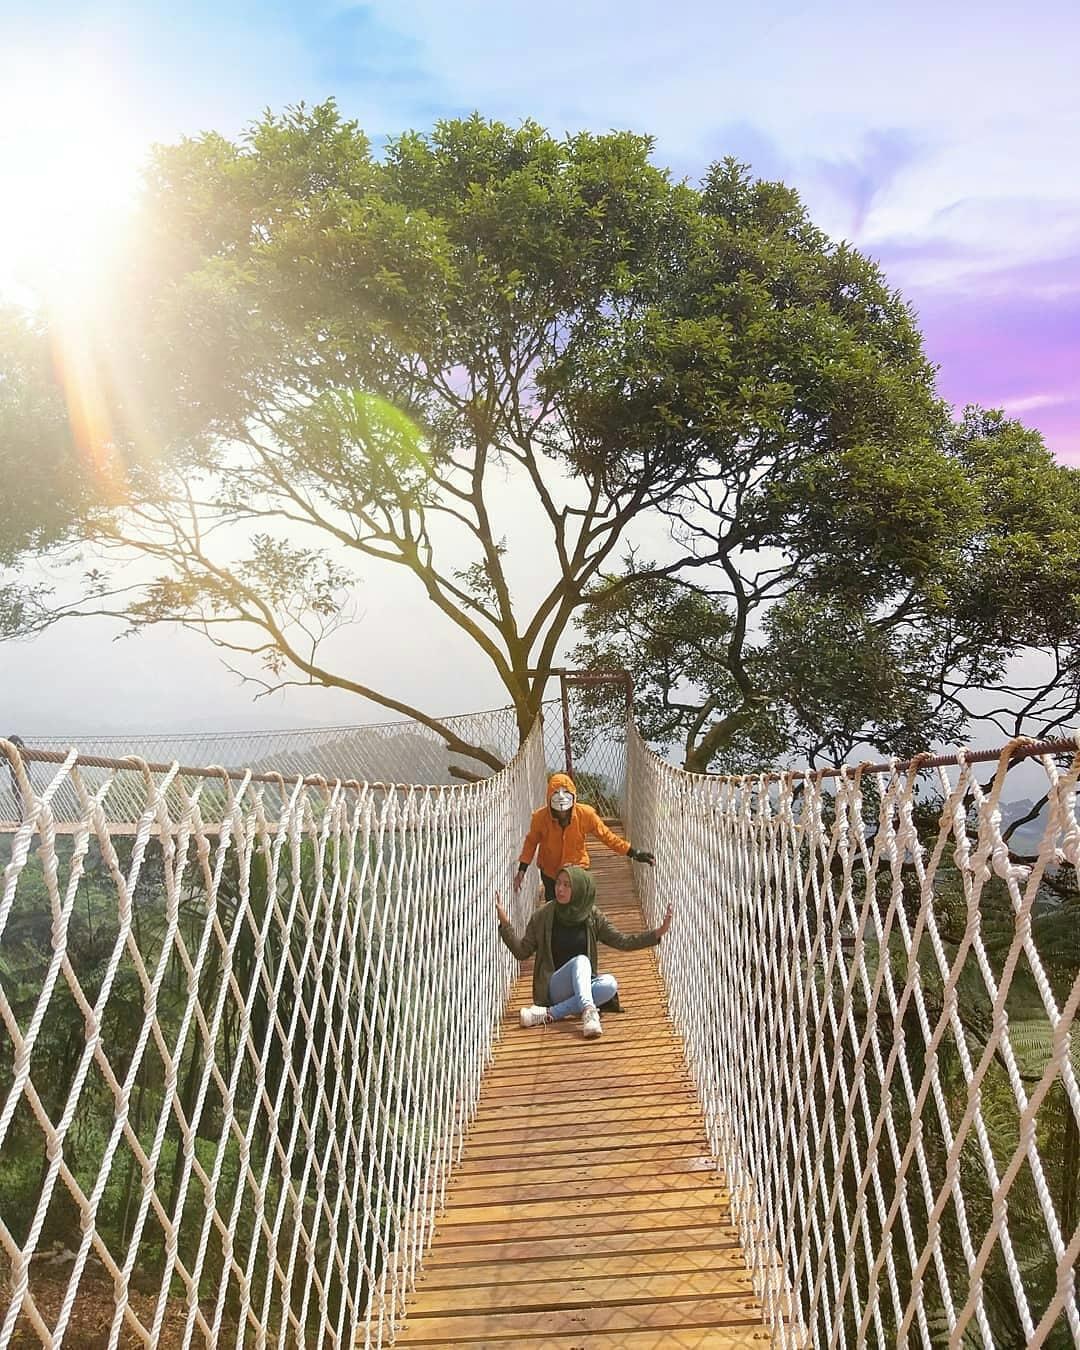 Harga Tiket Masuk Dan Lokasi Bukit Halimun Salak Bogor